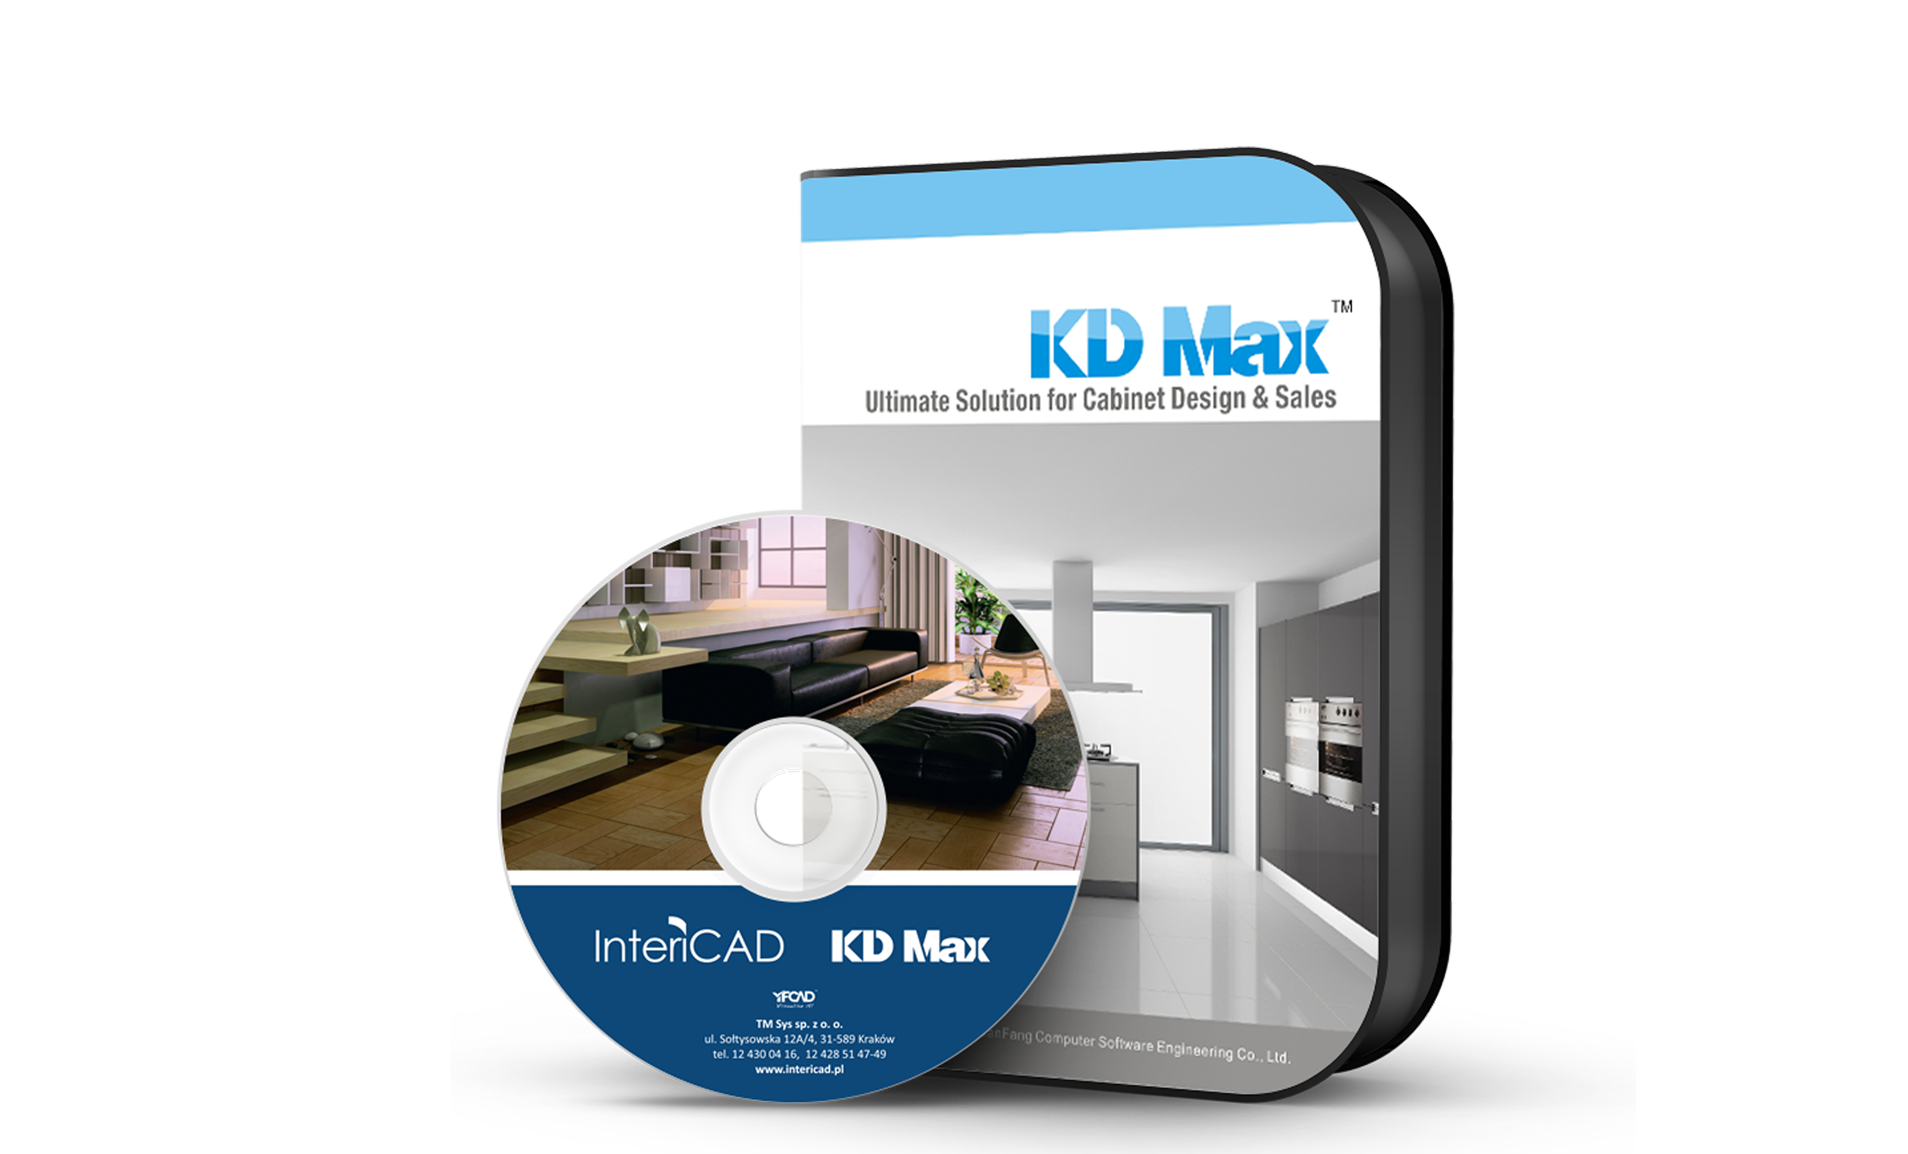 Kd Max 3d Software Haks Software Interior Design Software Design Software Cad Software Best Design Software Best 3d Software Software For Architects Software For Interior Designers